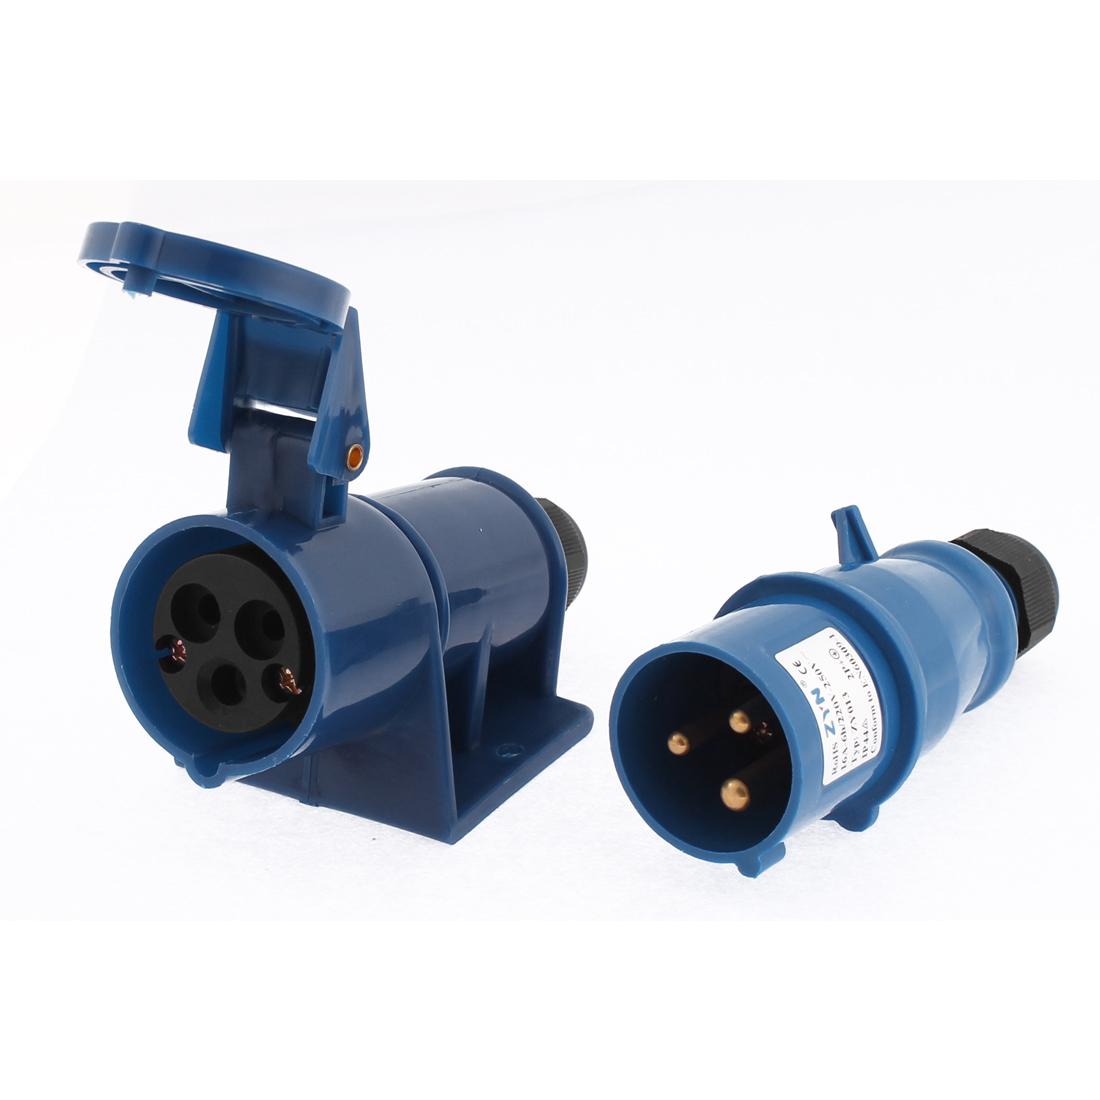 Waterproof Plastic Casing 2P+E Industrial Socket AC 220-250V 16A